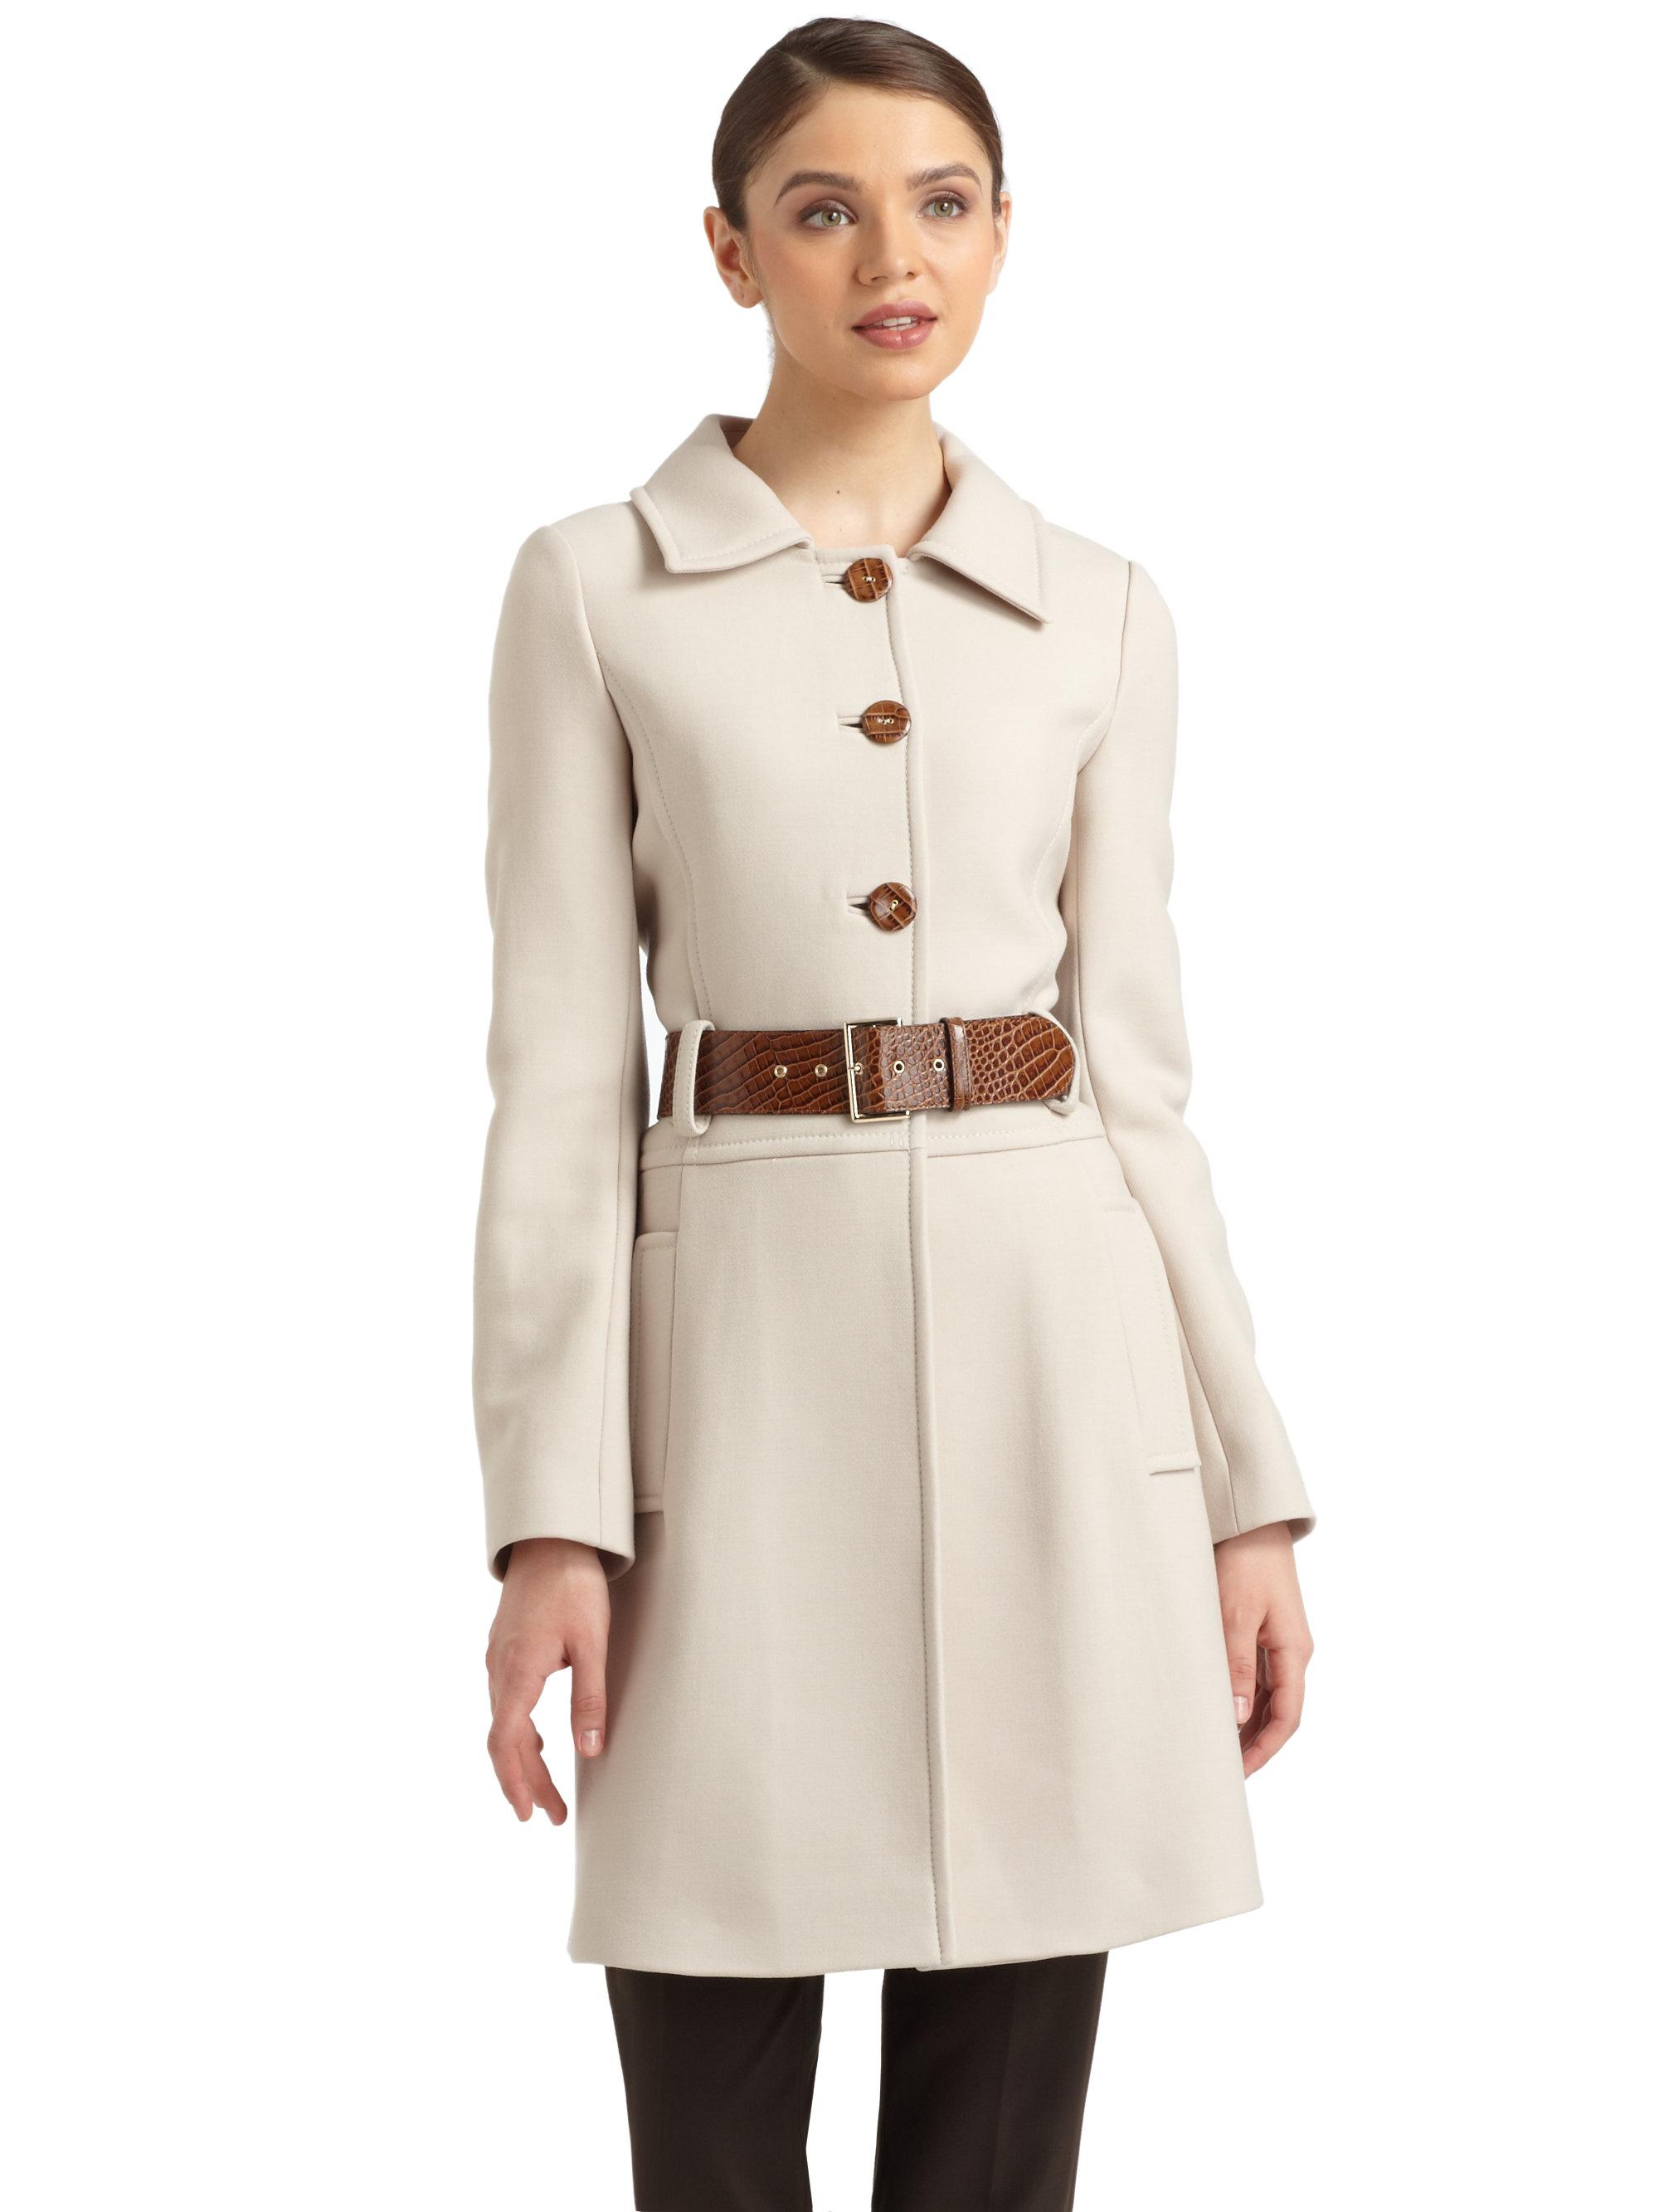 Lyst - Philosophy di Alberta Ferretti Buttonfront Belted Wool Coat ... c6c1c1981